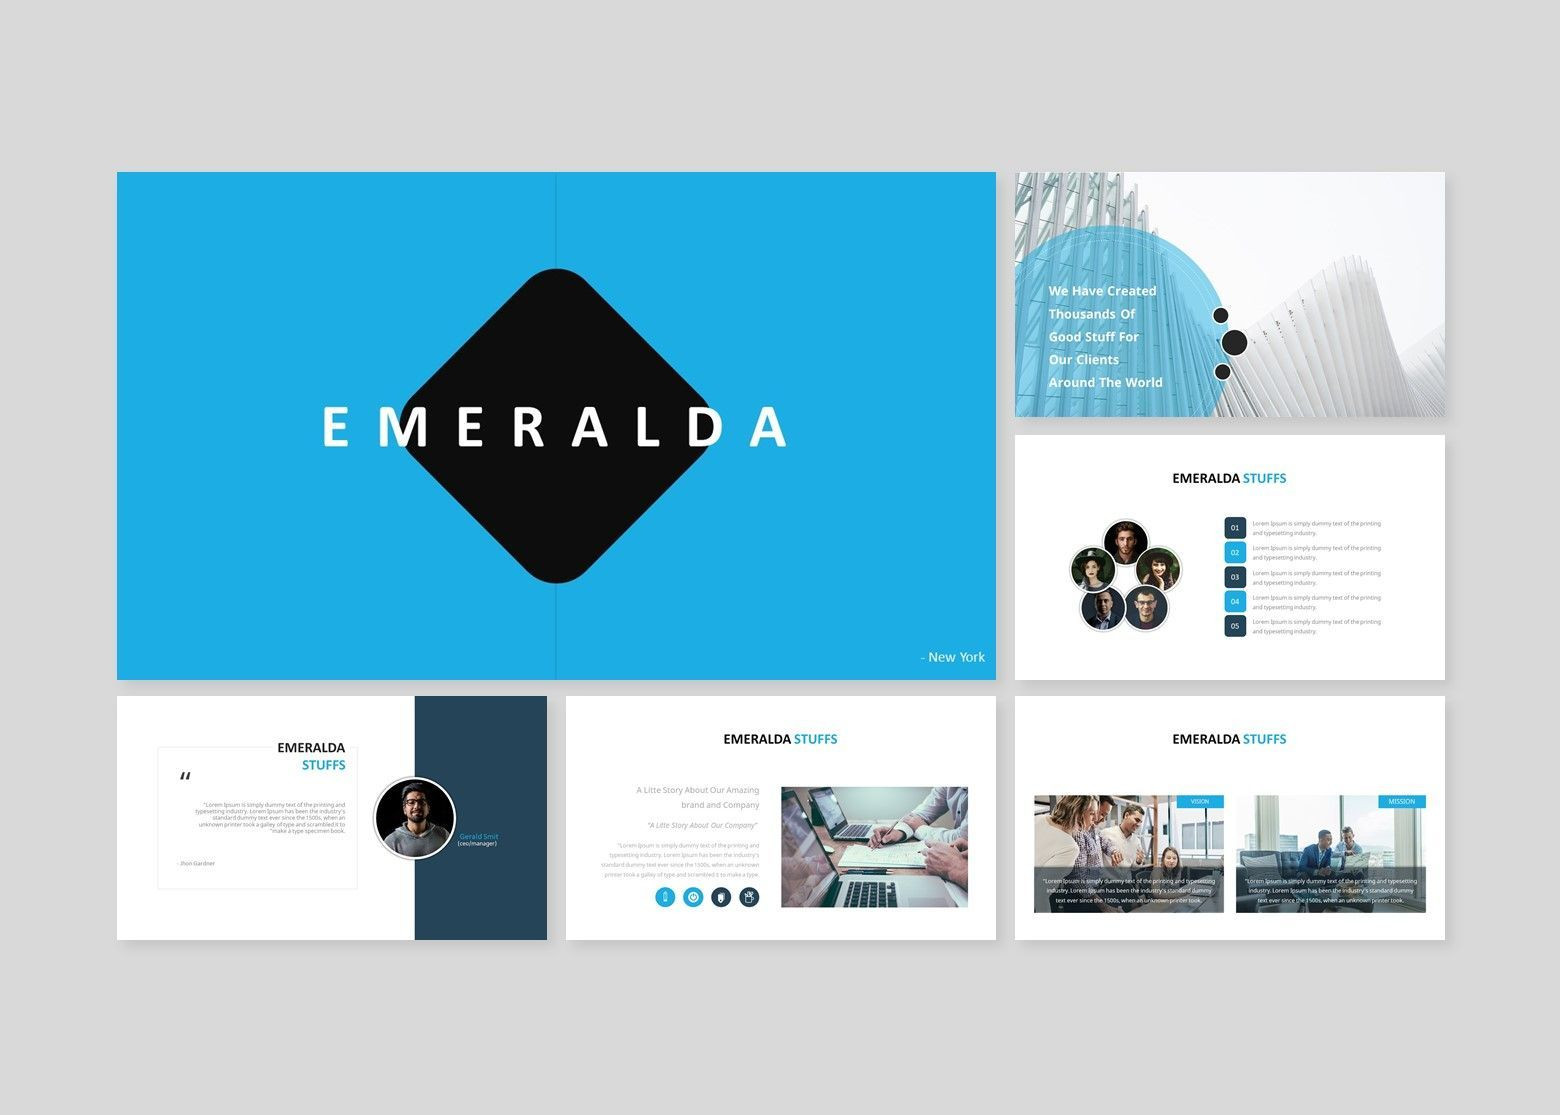 Emeralda – Creative Google Slide Business Template, Slide 2, 08570, Business Models — PoweredTemplate.com